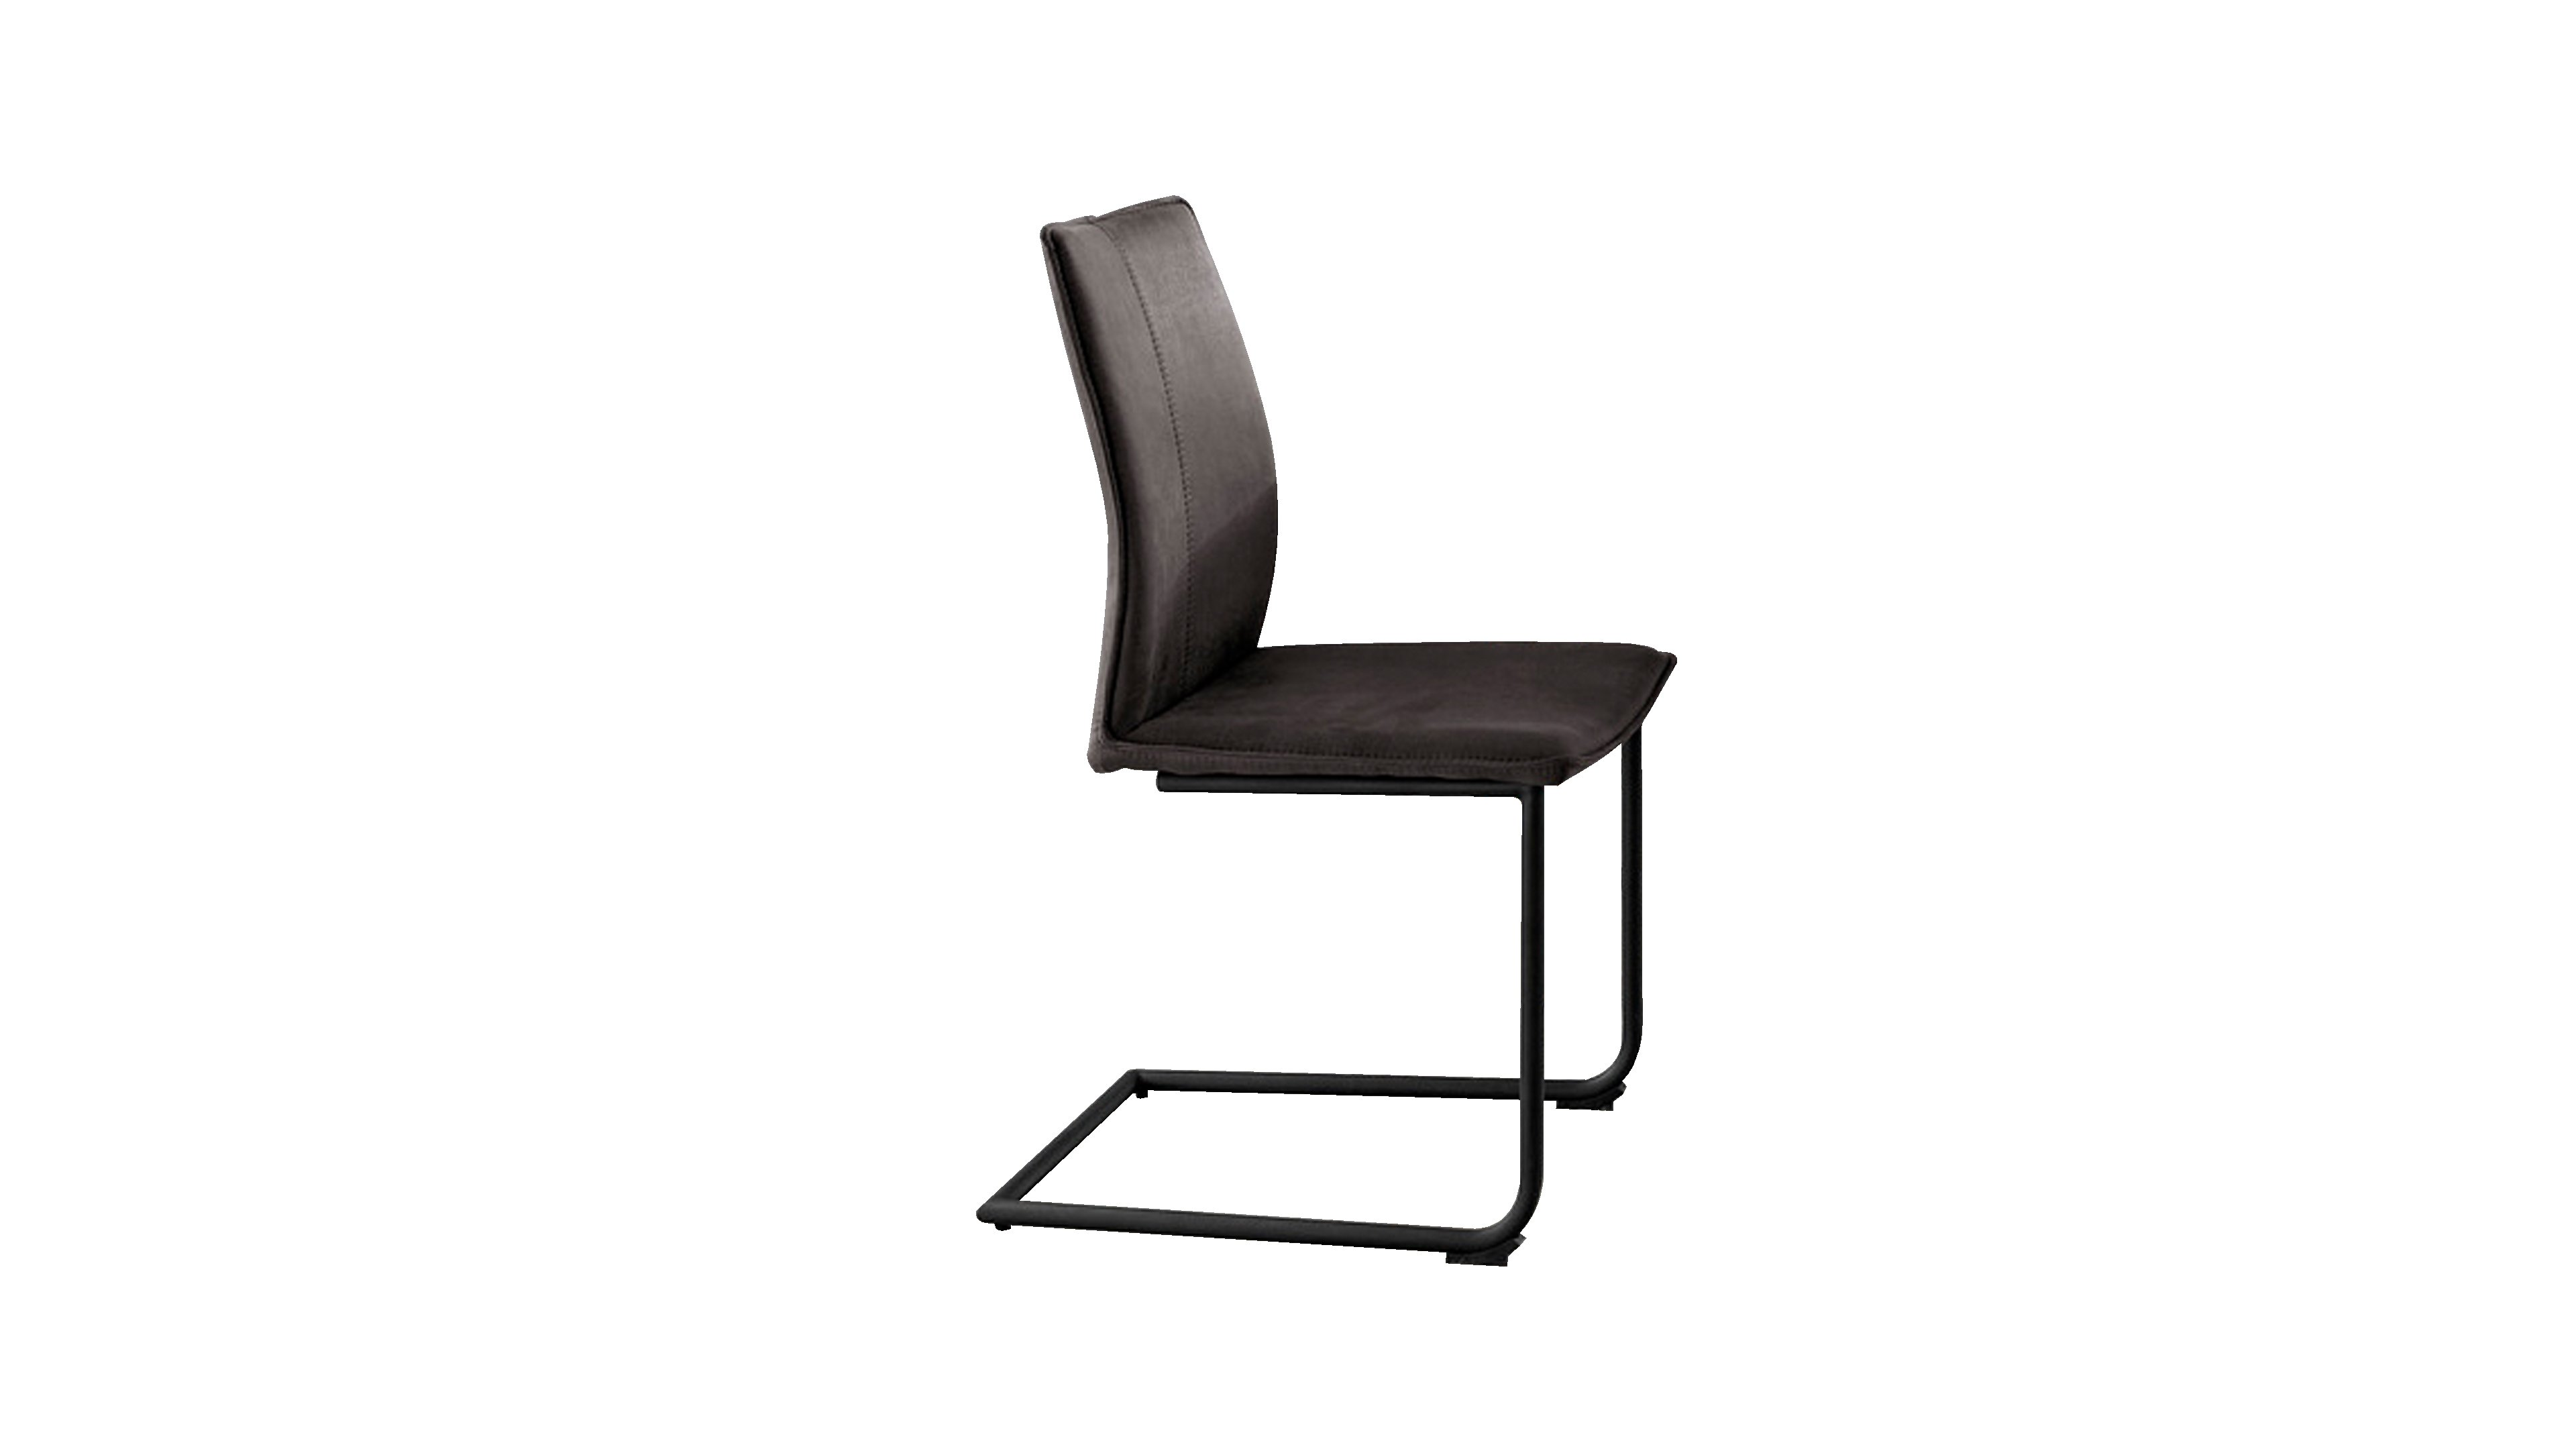 Stuhl Capri MetallEisen/Roheisen,Mikrofaser (Textilfaser)